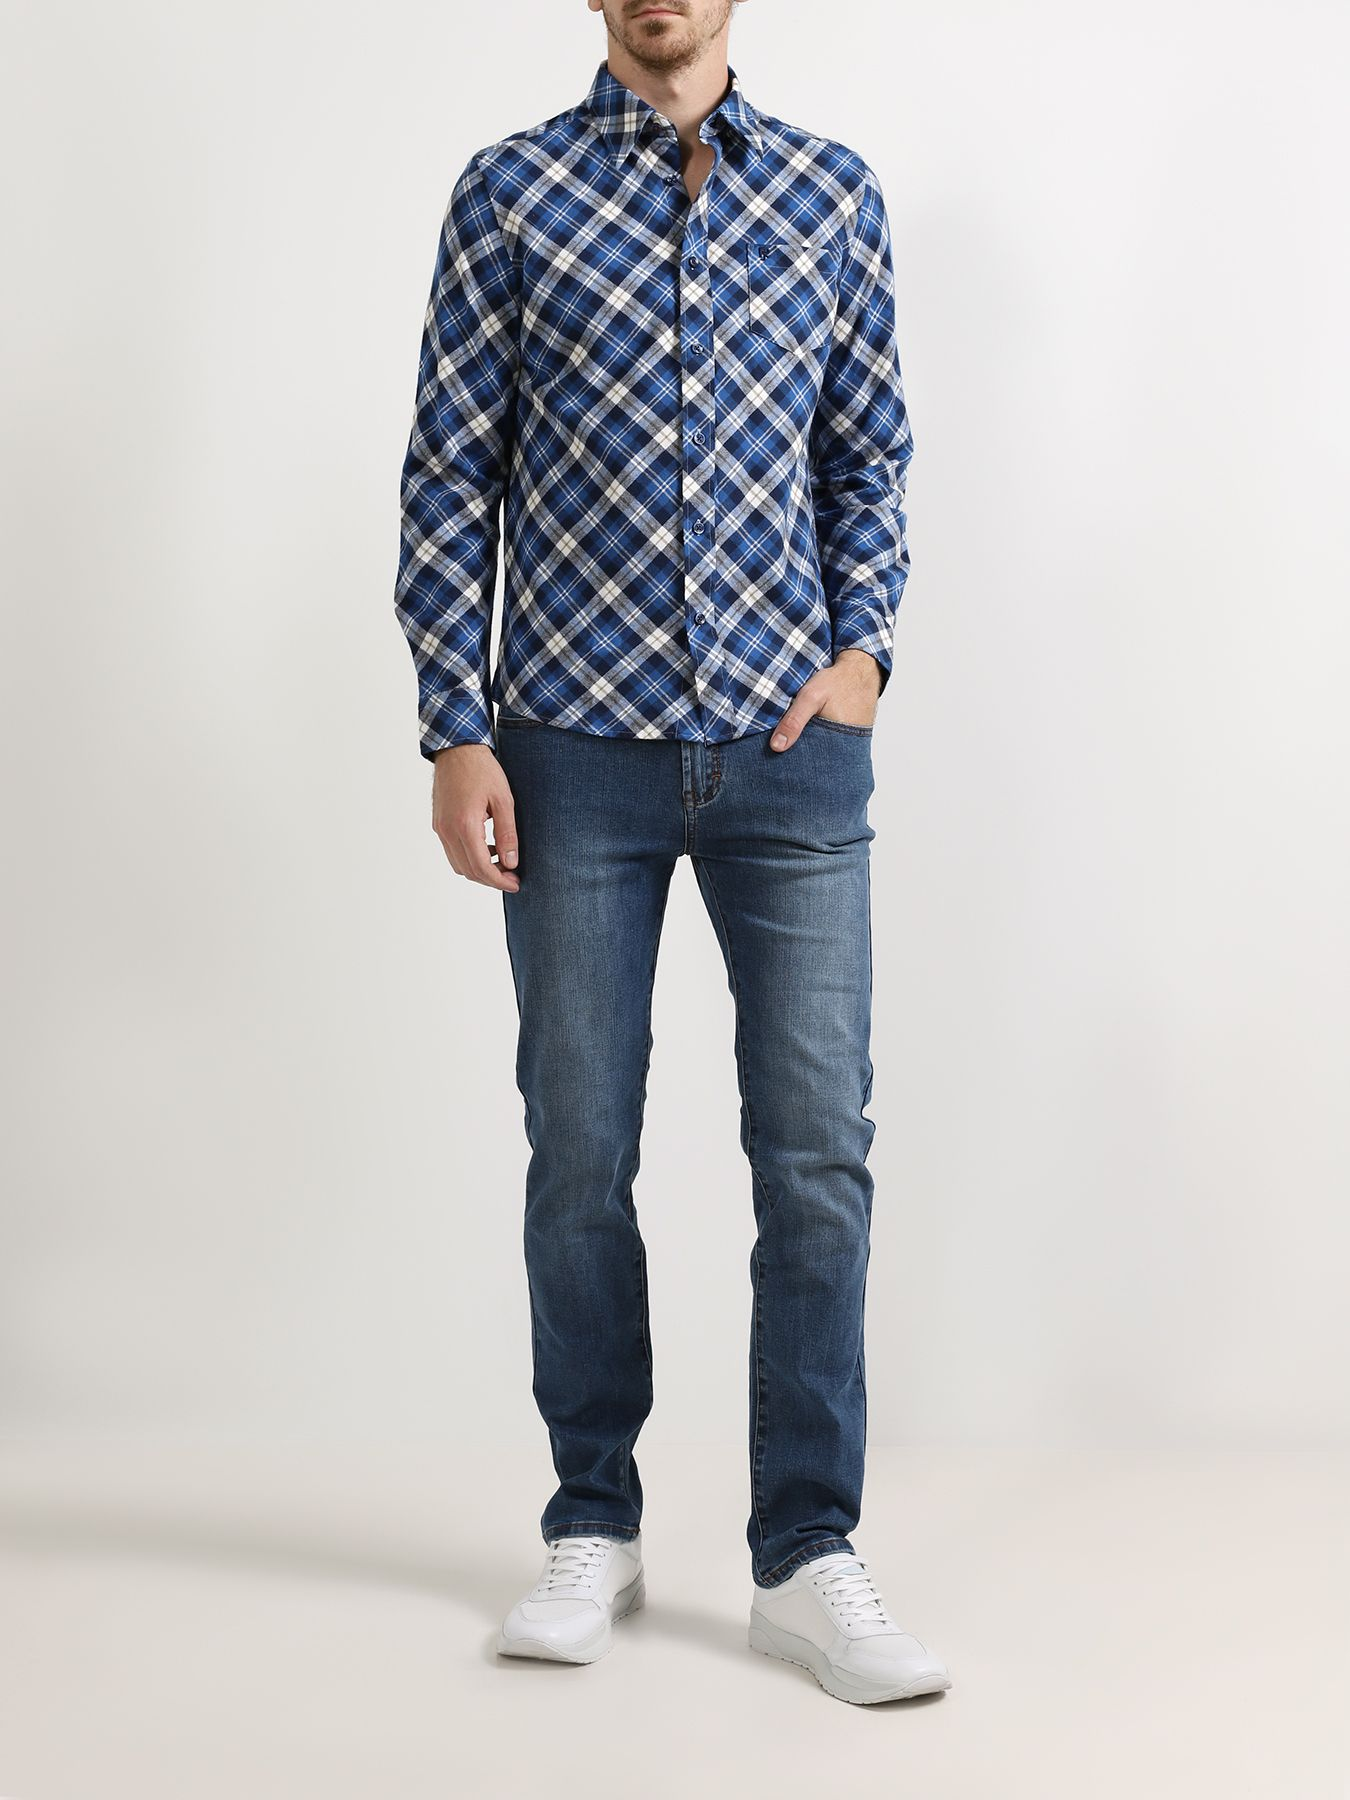 Alessandro Manzoni Jeans Зауженные джинсы фото